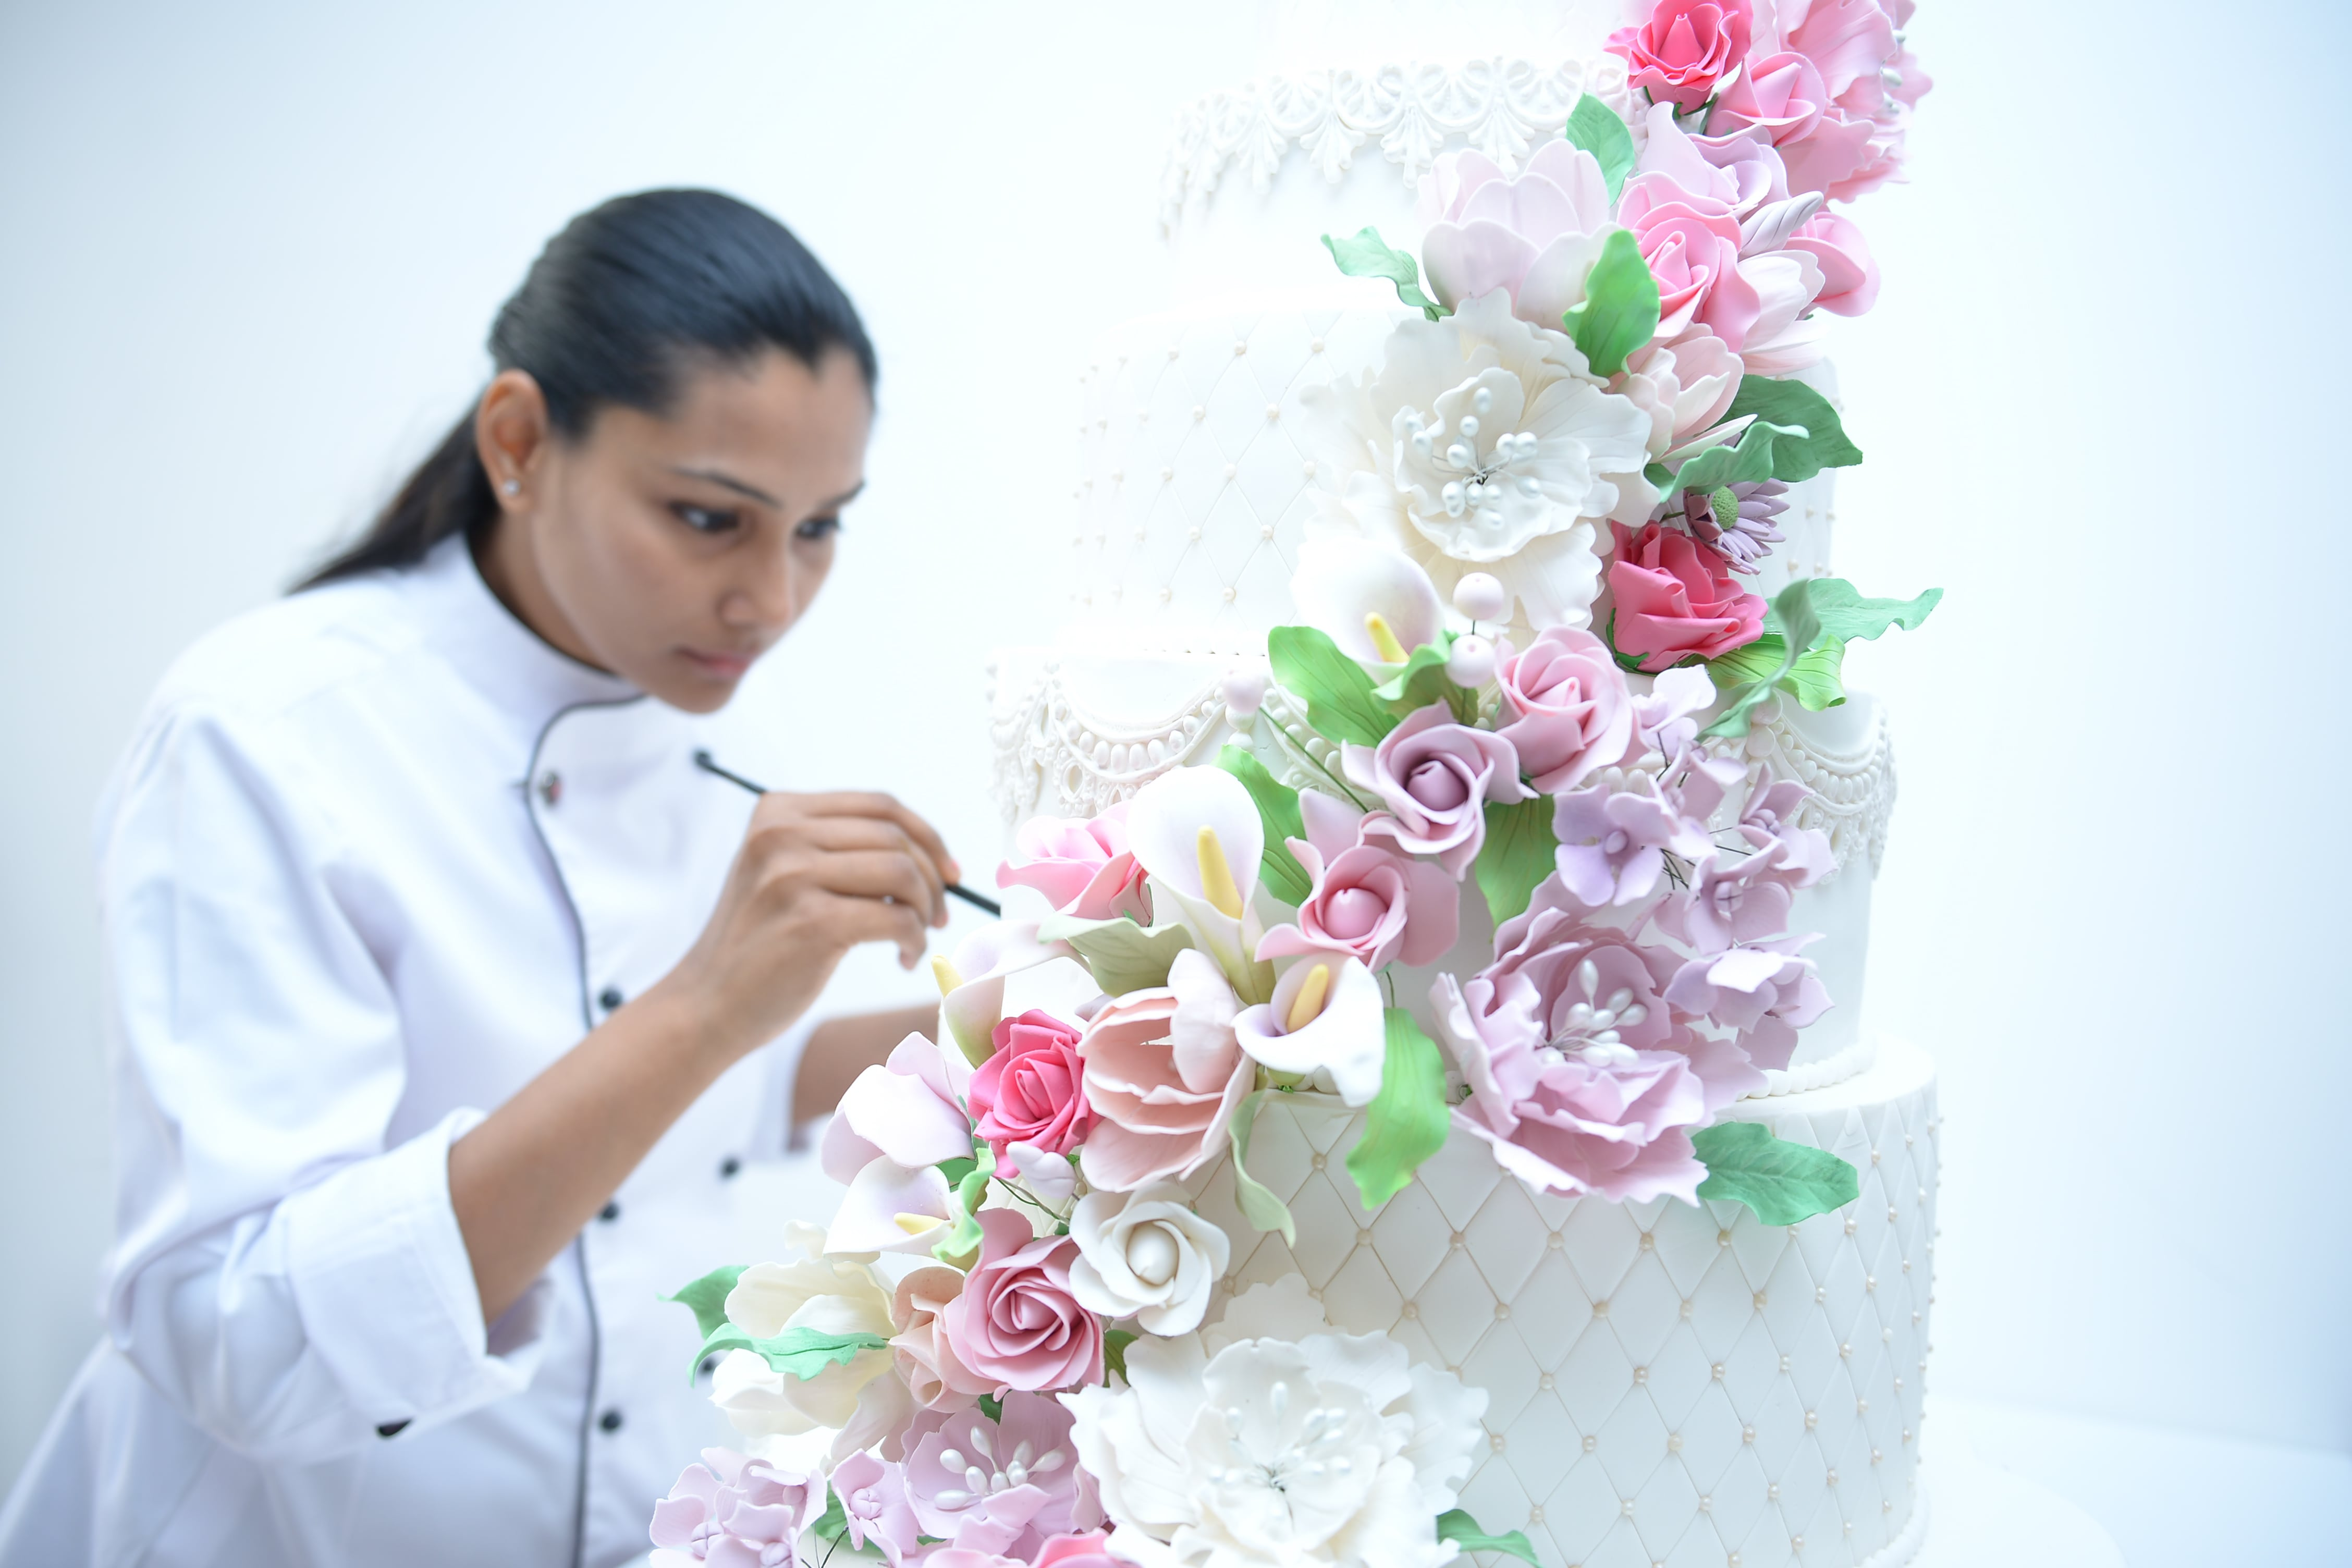 Cake Artist at work